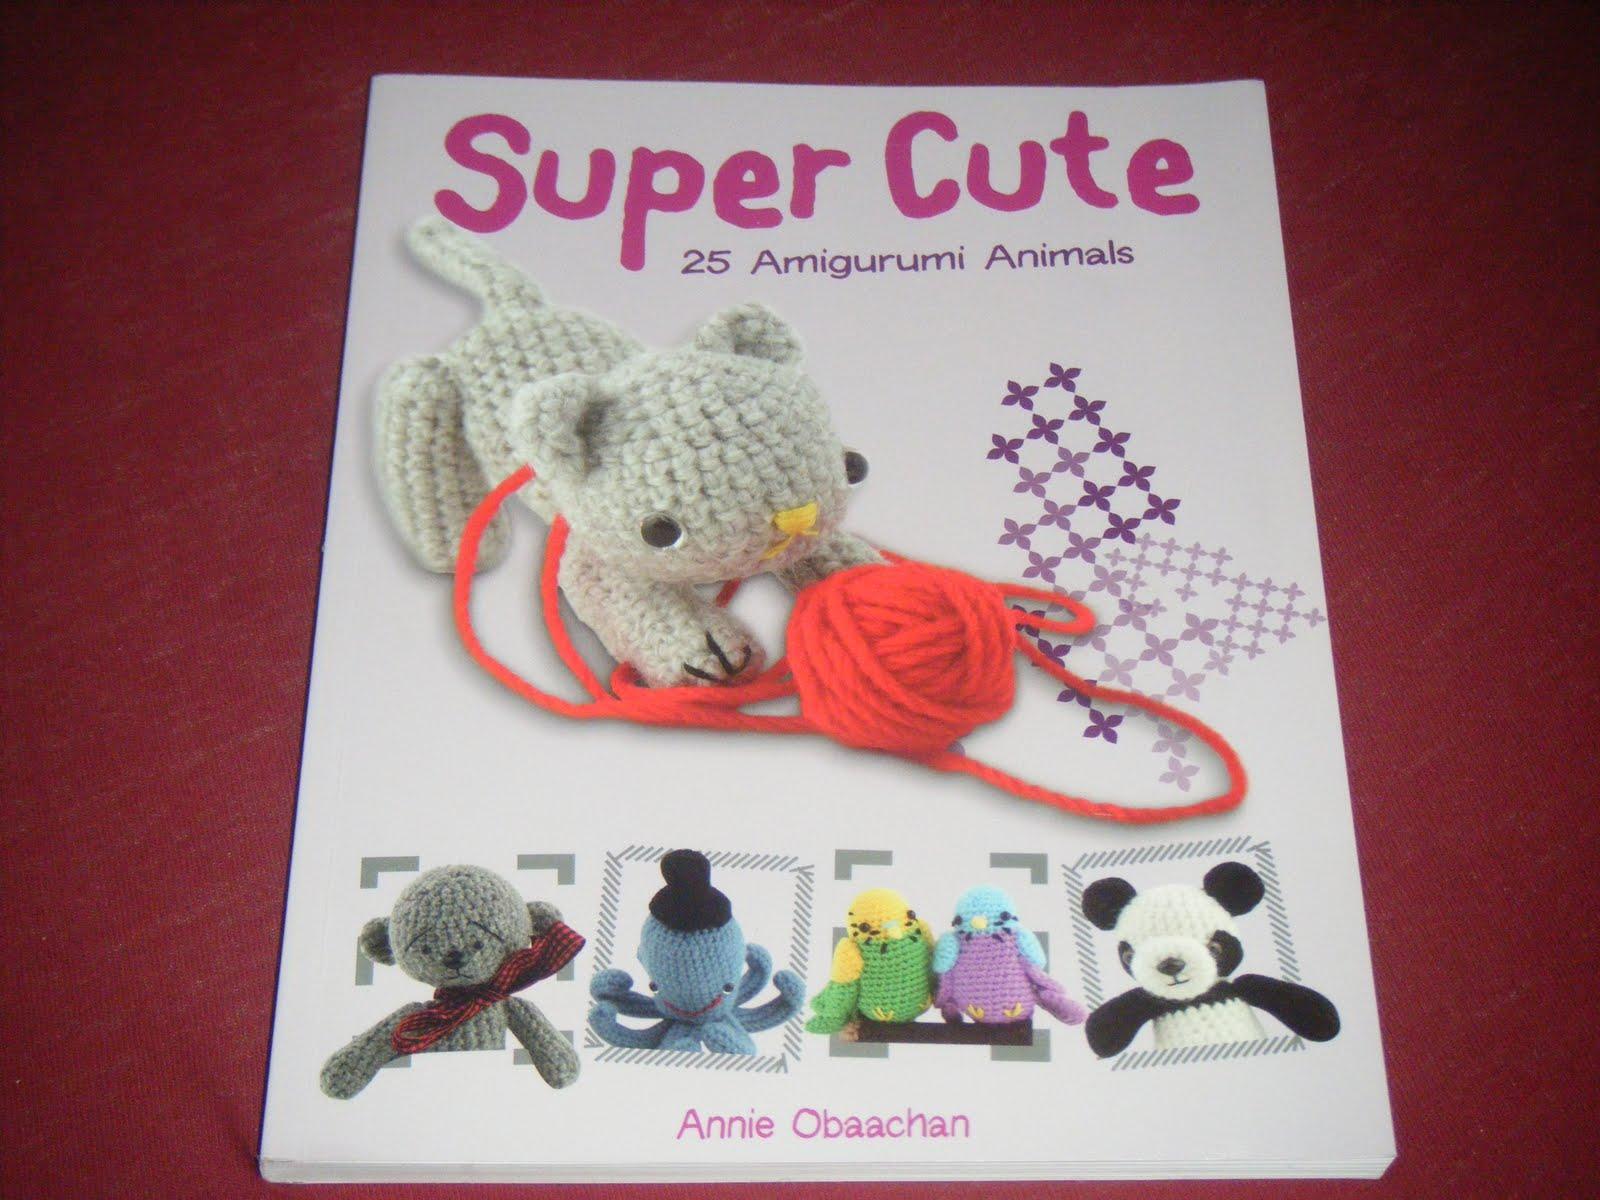 Amigurumi Animals Annie Obaachan : The glorious books!: Super cute: 25 amigurumi animals